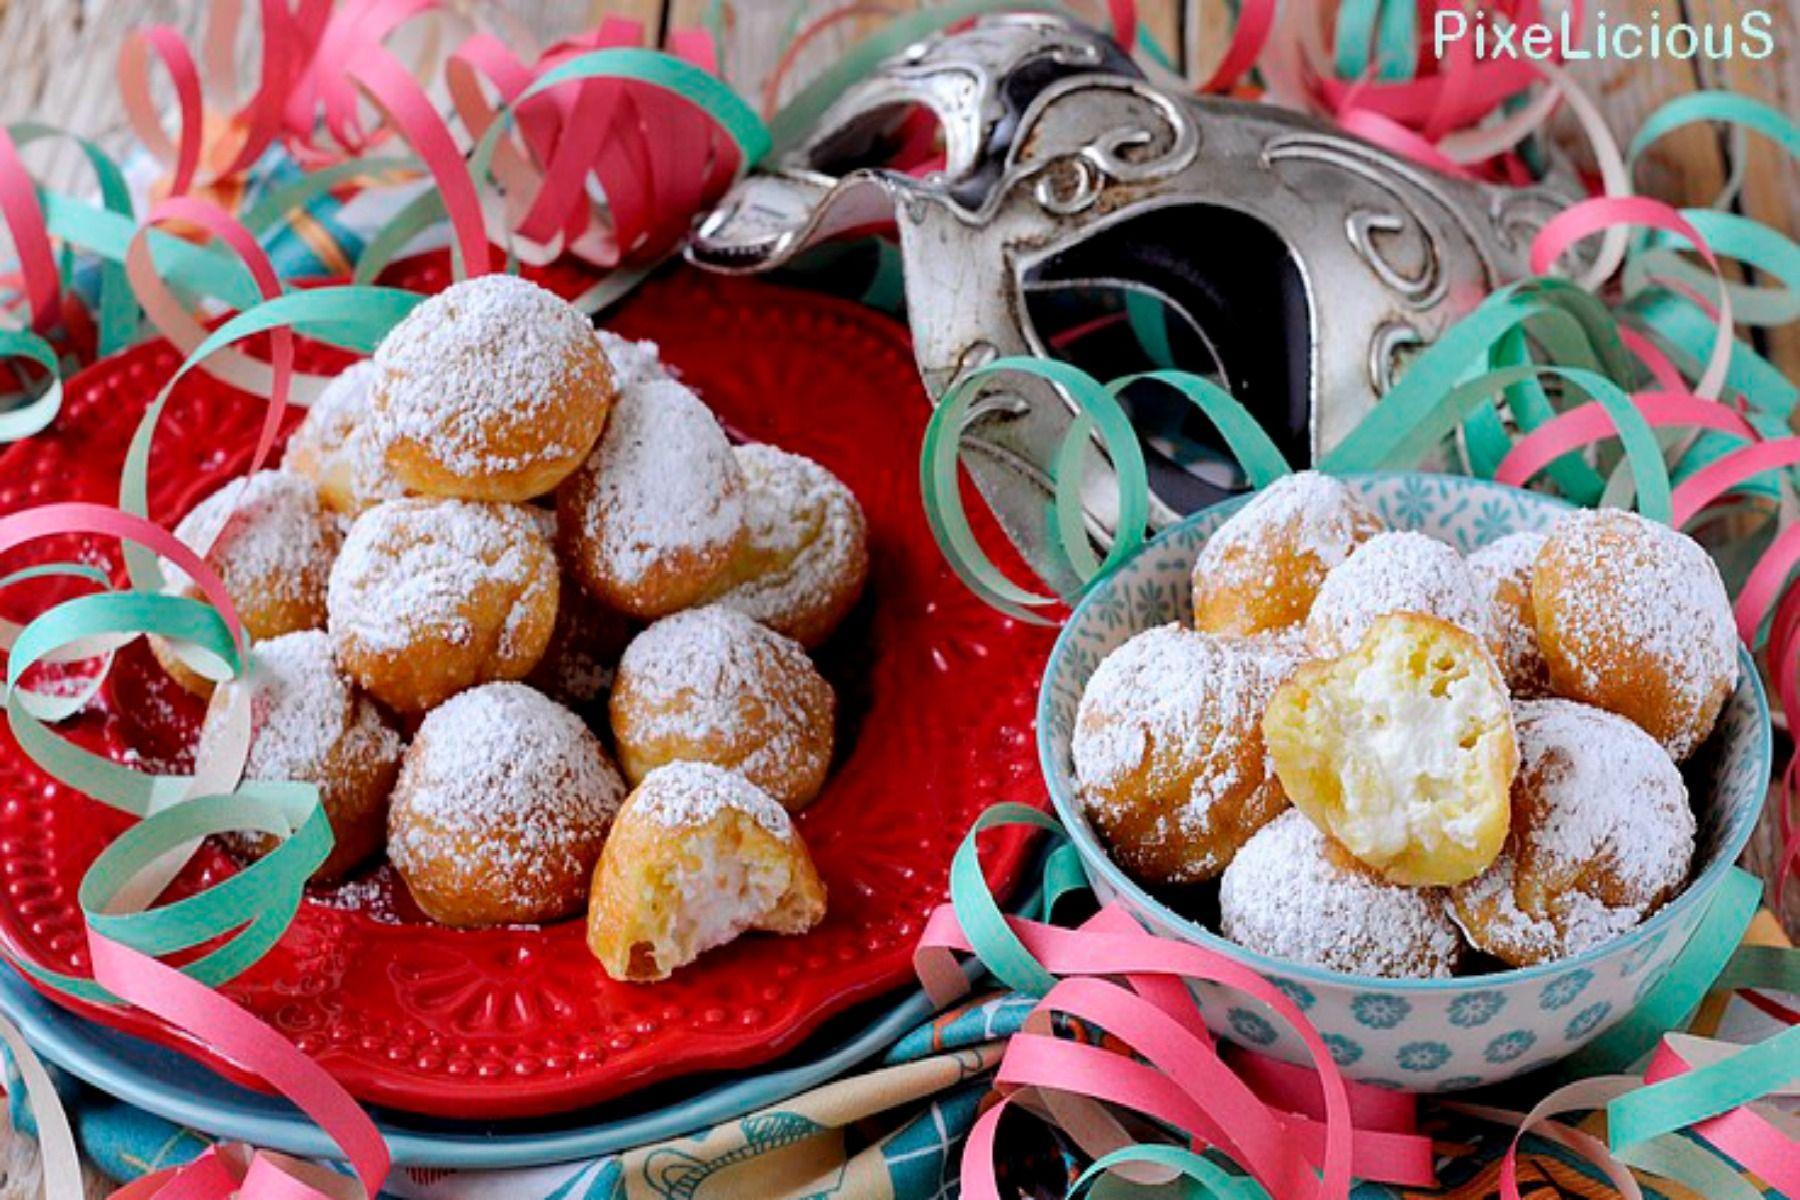 10 dolci fritti da provare a Carnevale